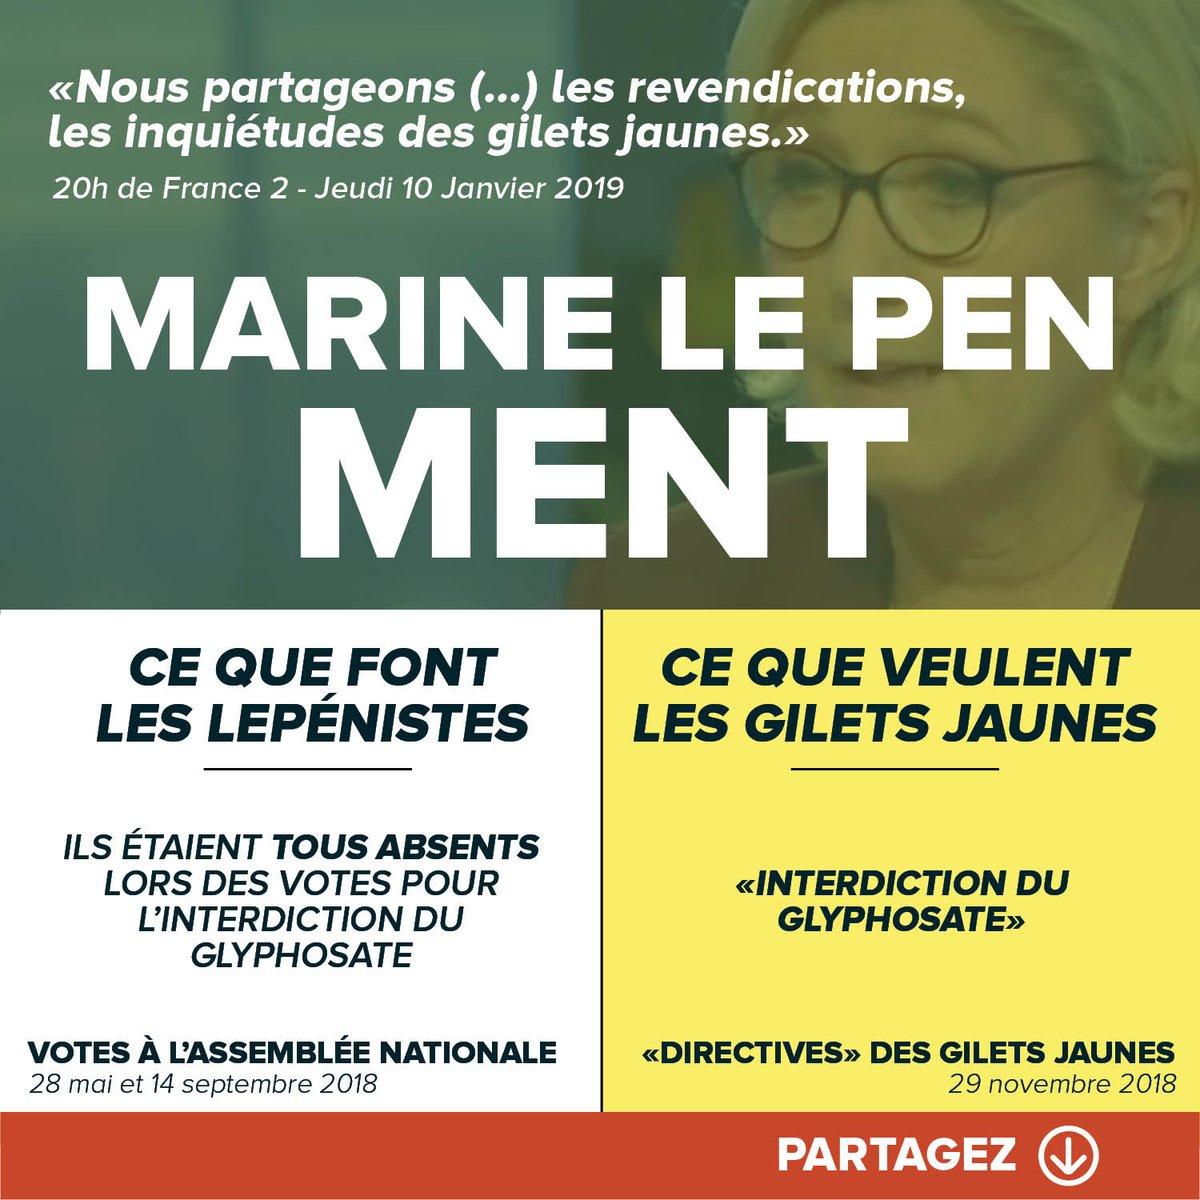 #MarineLePenMent sur le glyphosate.  #Acte9 #ActeIX <br>http://pic.twitter.com/8iGaxSNNg7